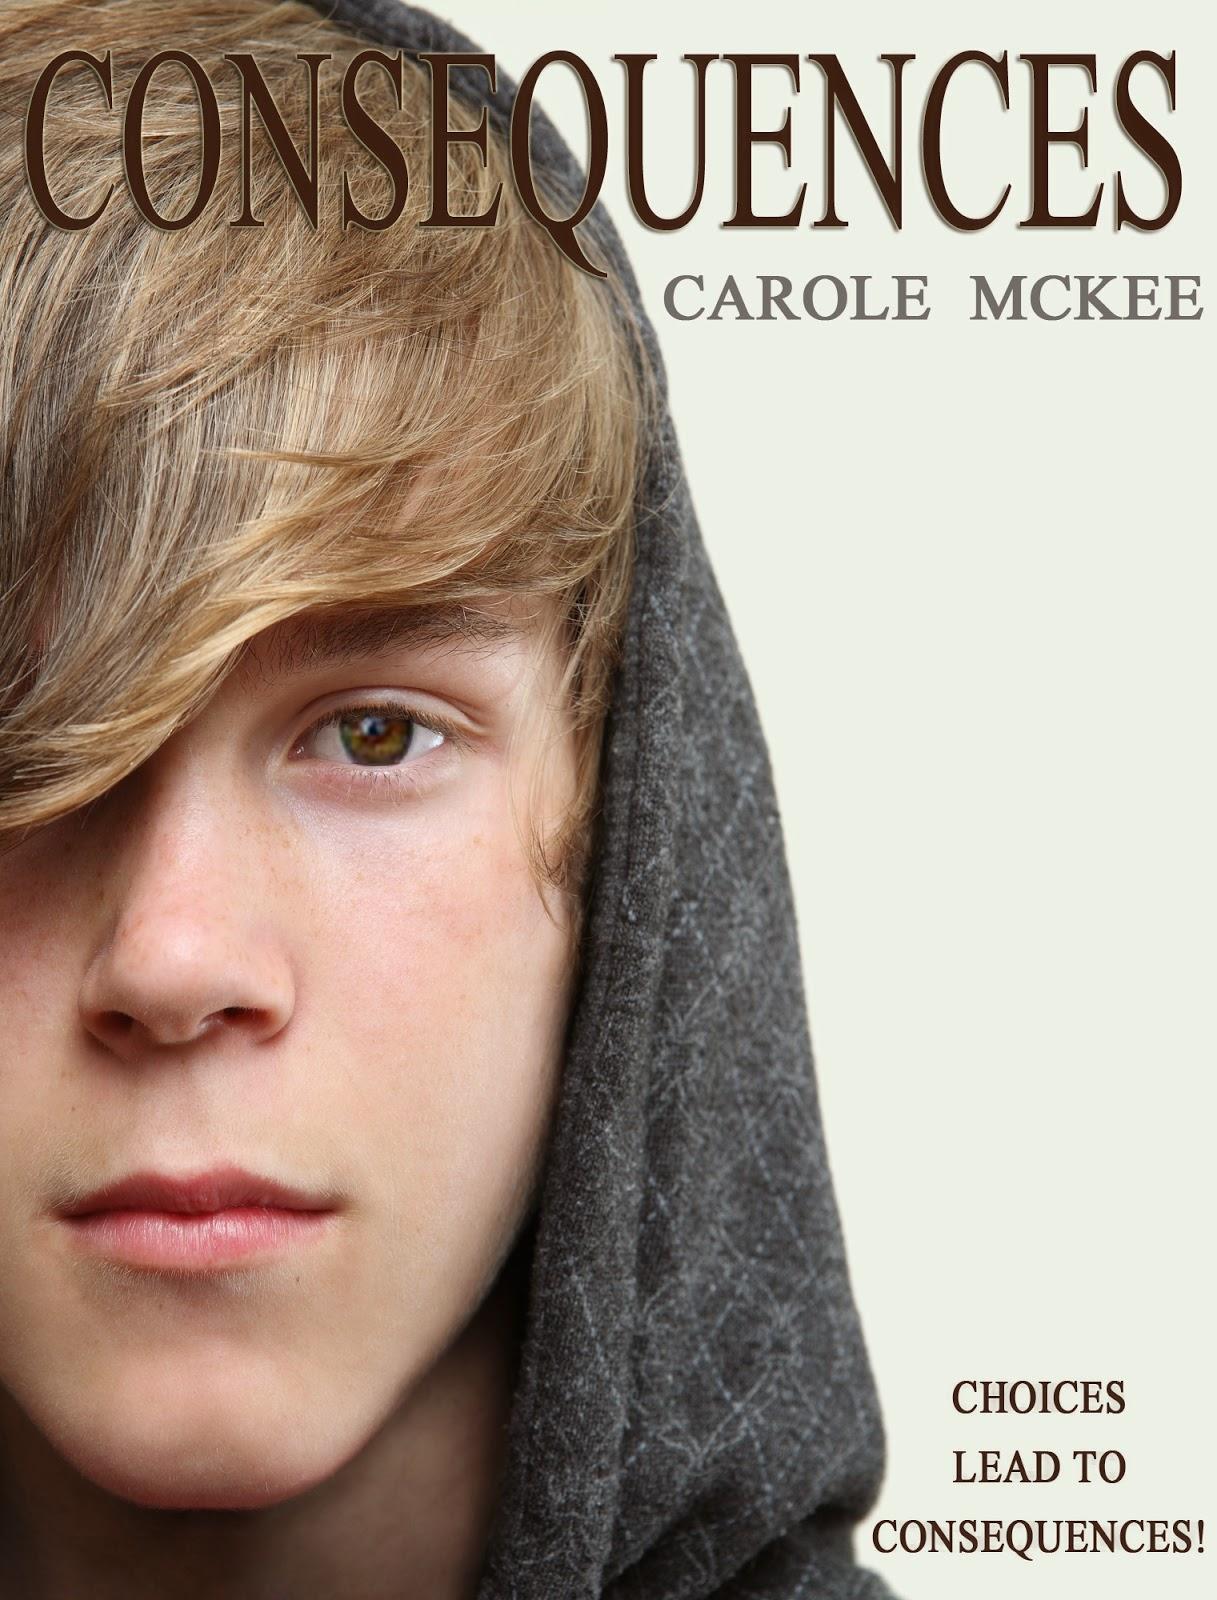 http://www.amazon.com/Consequences-Choices-4-Carole-McKee/dp/1482734370/ref=la_B0082D3810_1_3?s=books&ie=UTF8&qid=1402898660&sr=1-3